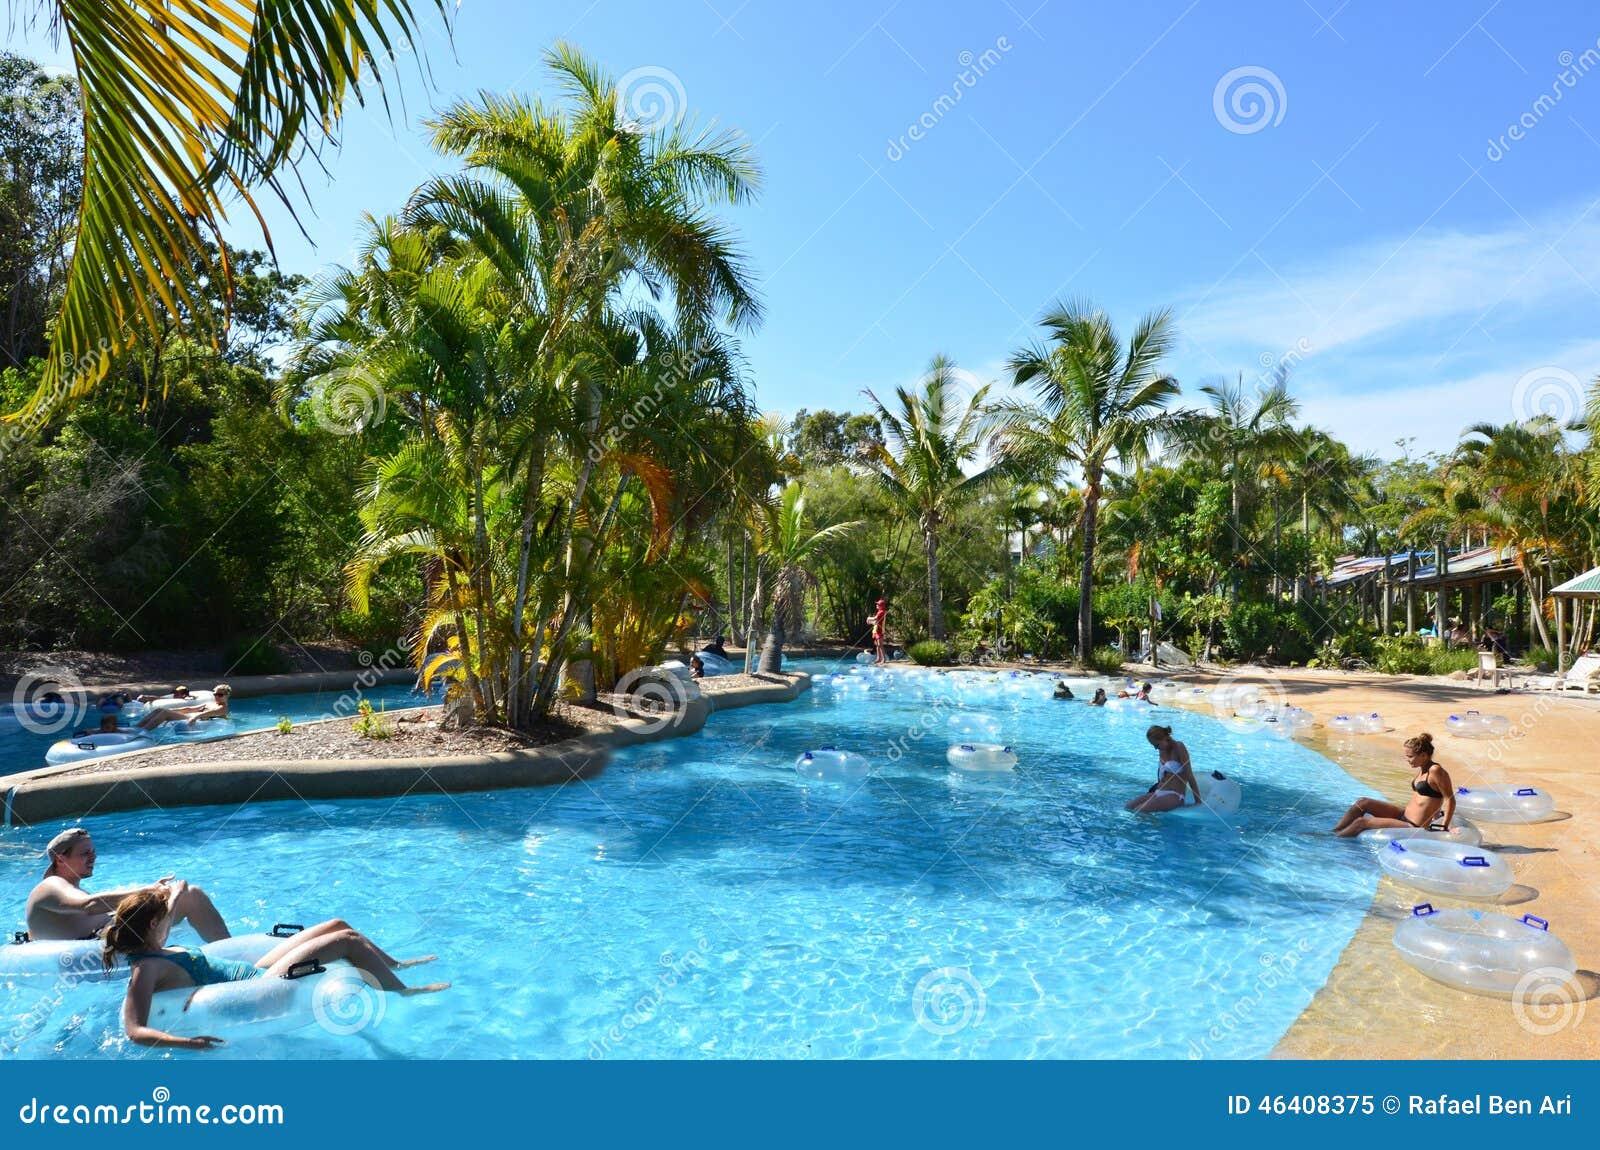 Wet n Wild Gold Coast Queensland Australia